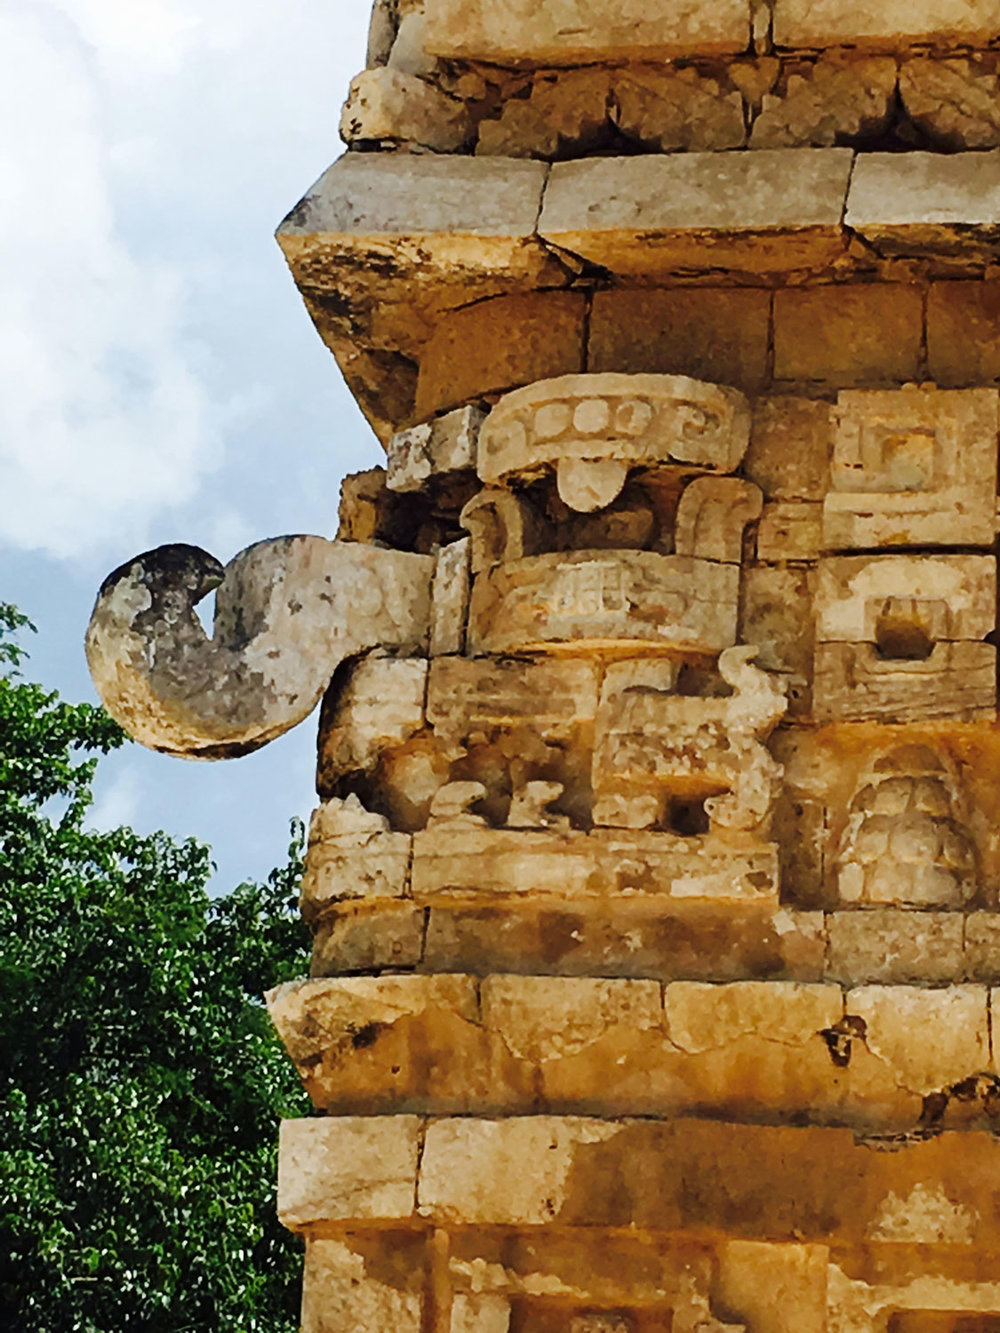 Hammocks_and_Ruins_Riviera_Maya_Mexico_Explore_What_to_Do_Yucatan_Ruins_Chichen_Itza_20.jpg